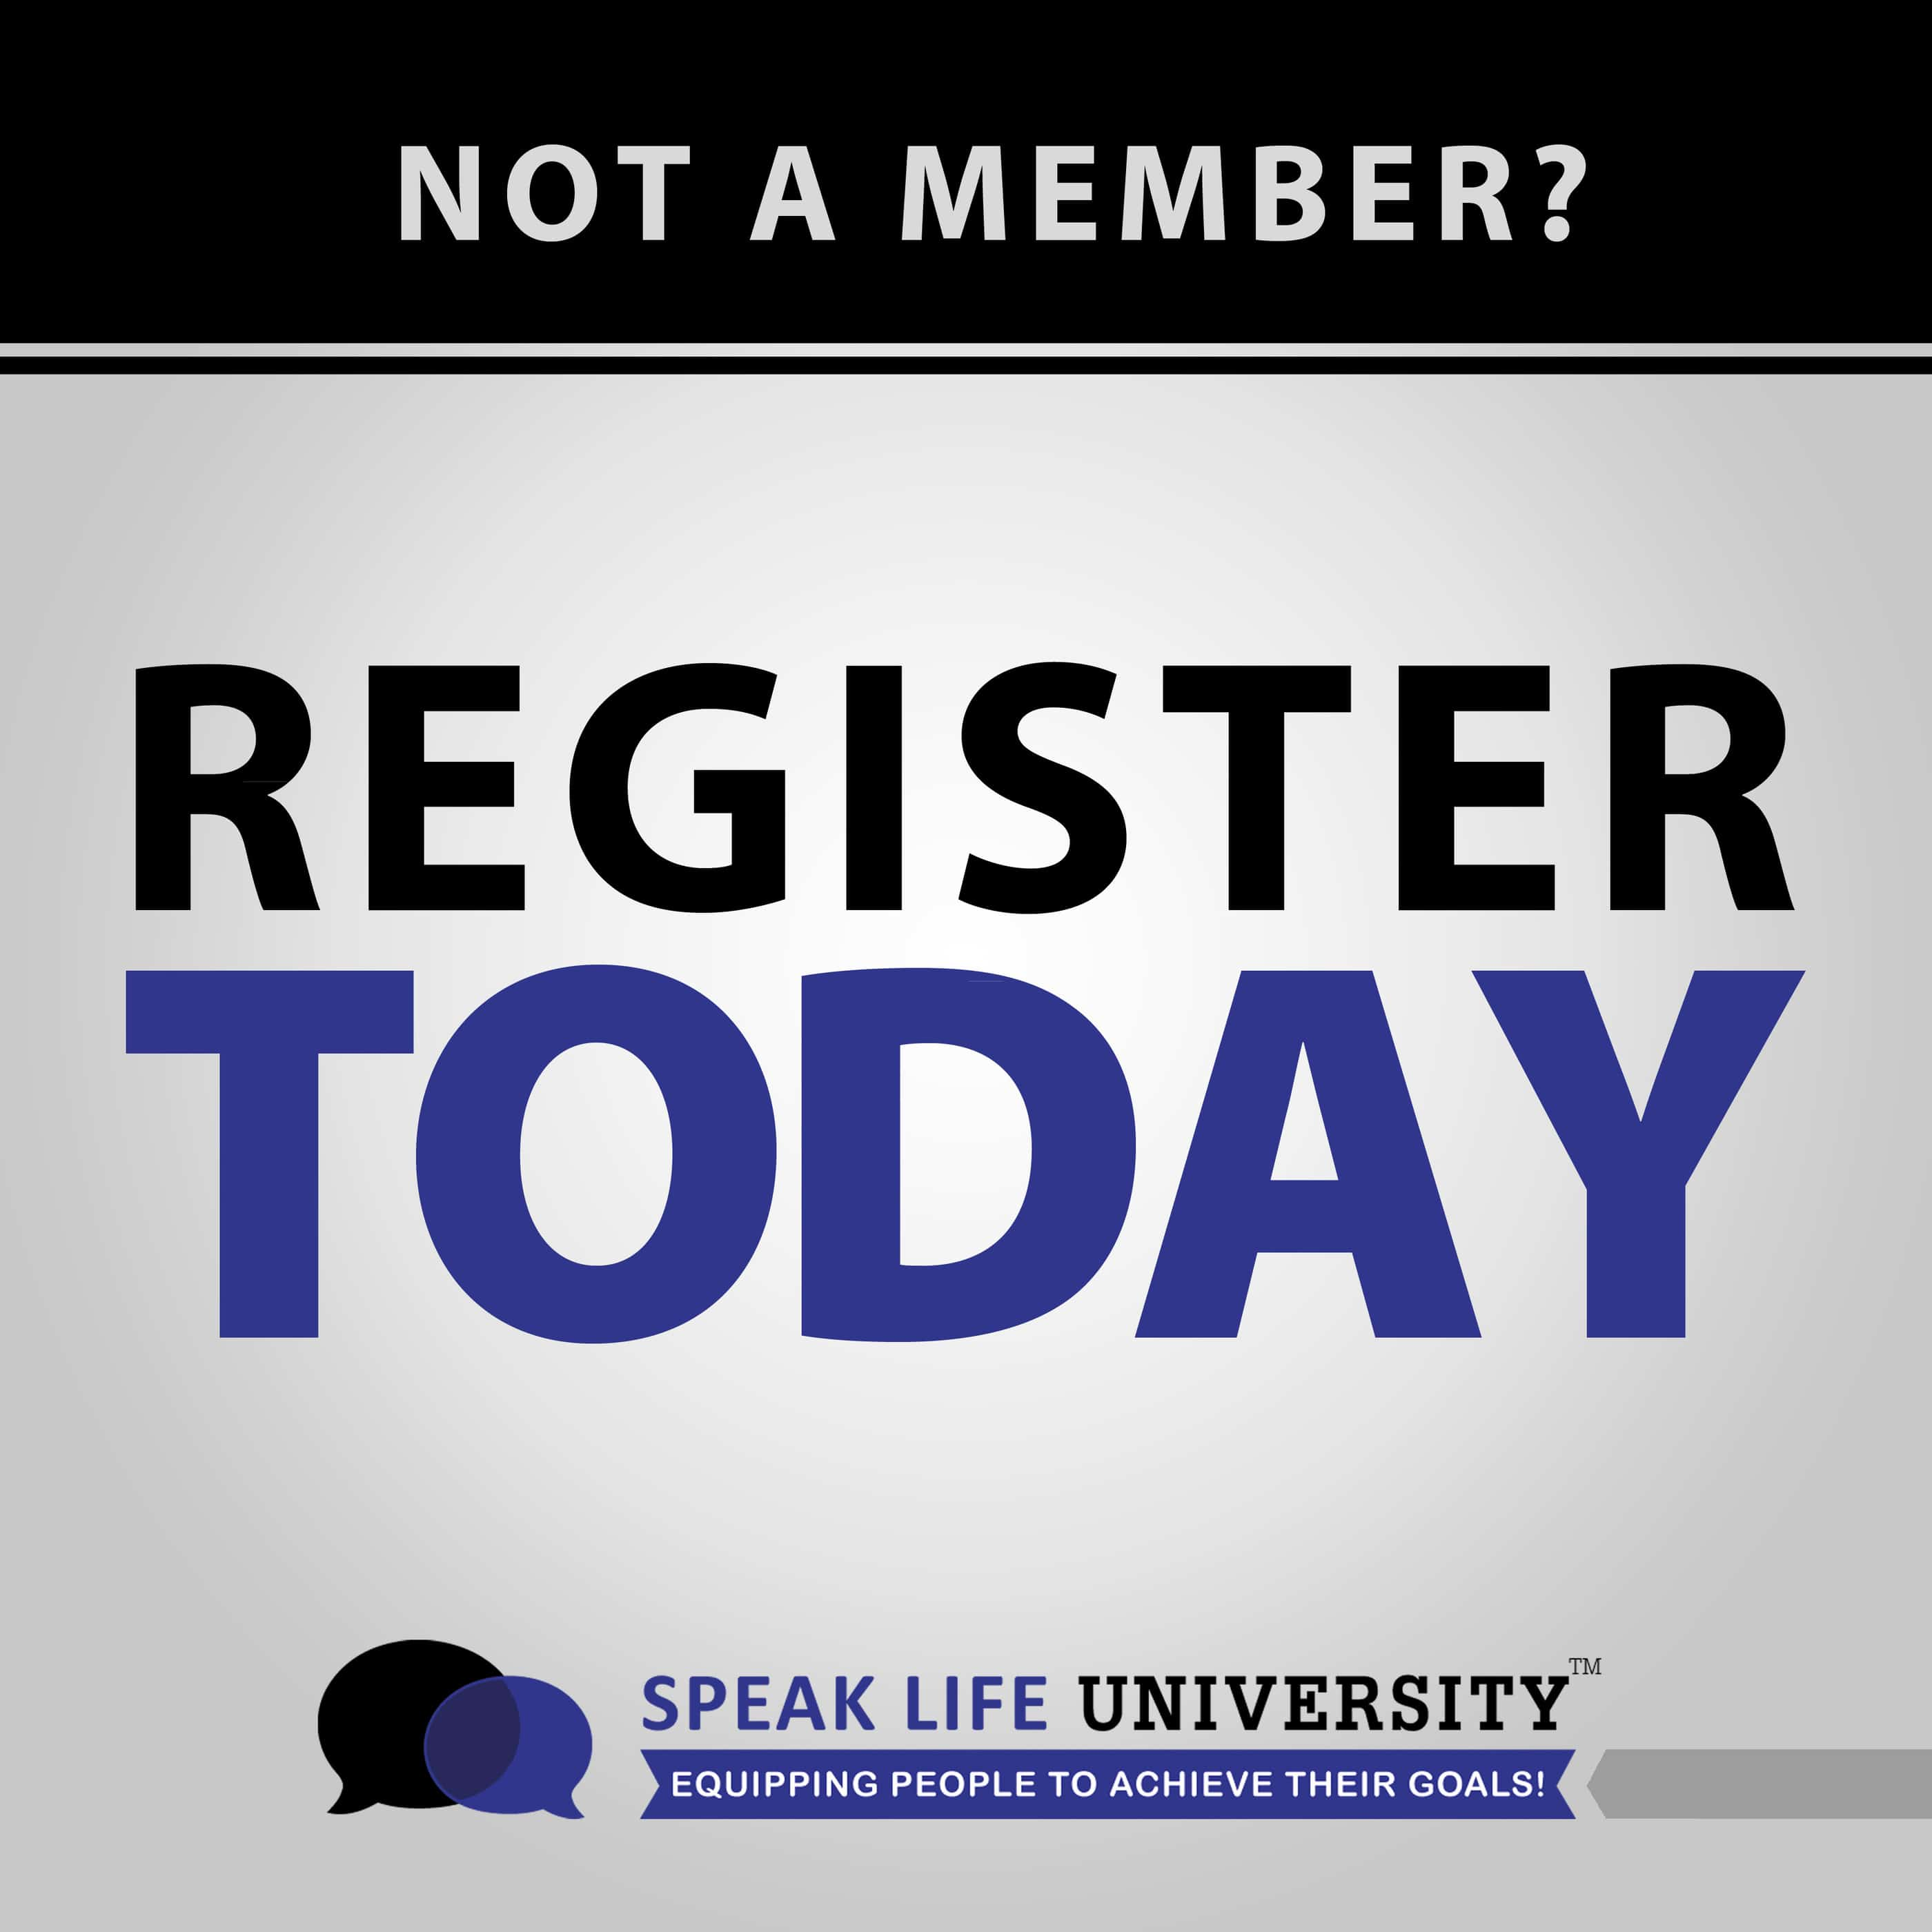 Dr. Jason Carthen: Speak Life University